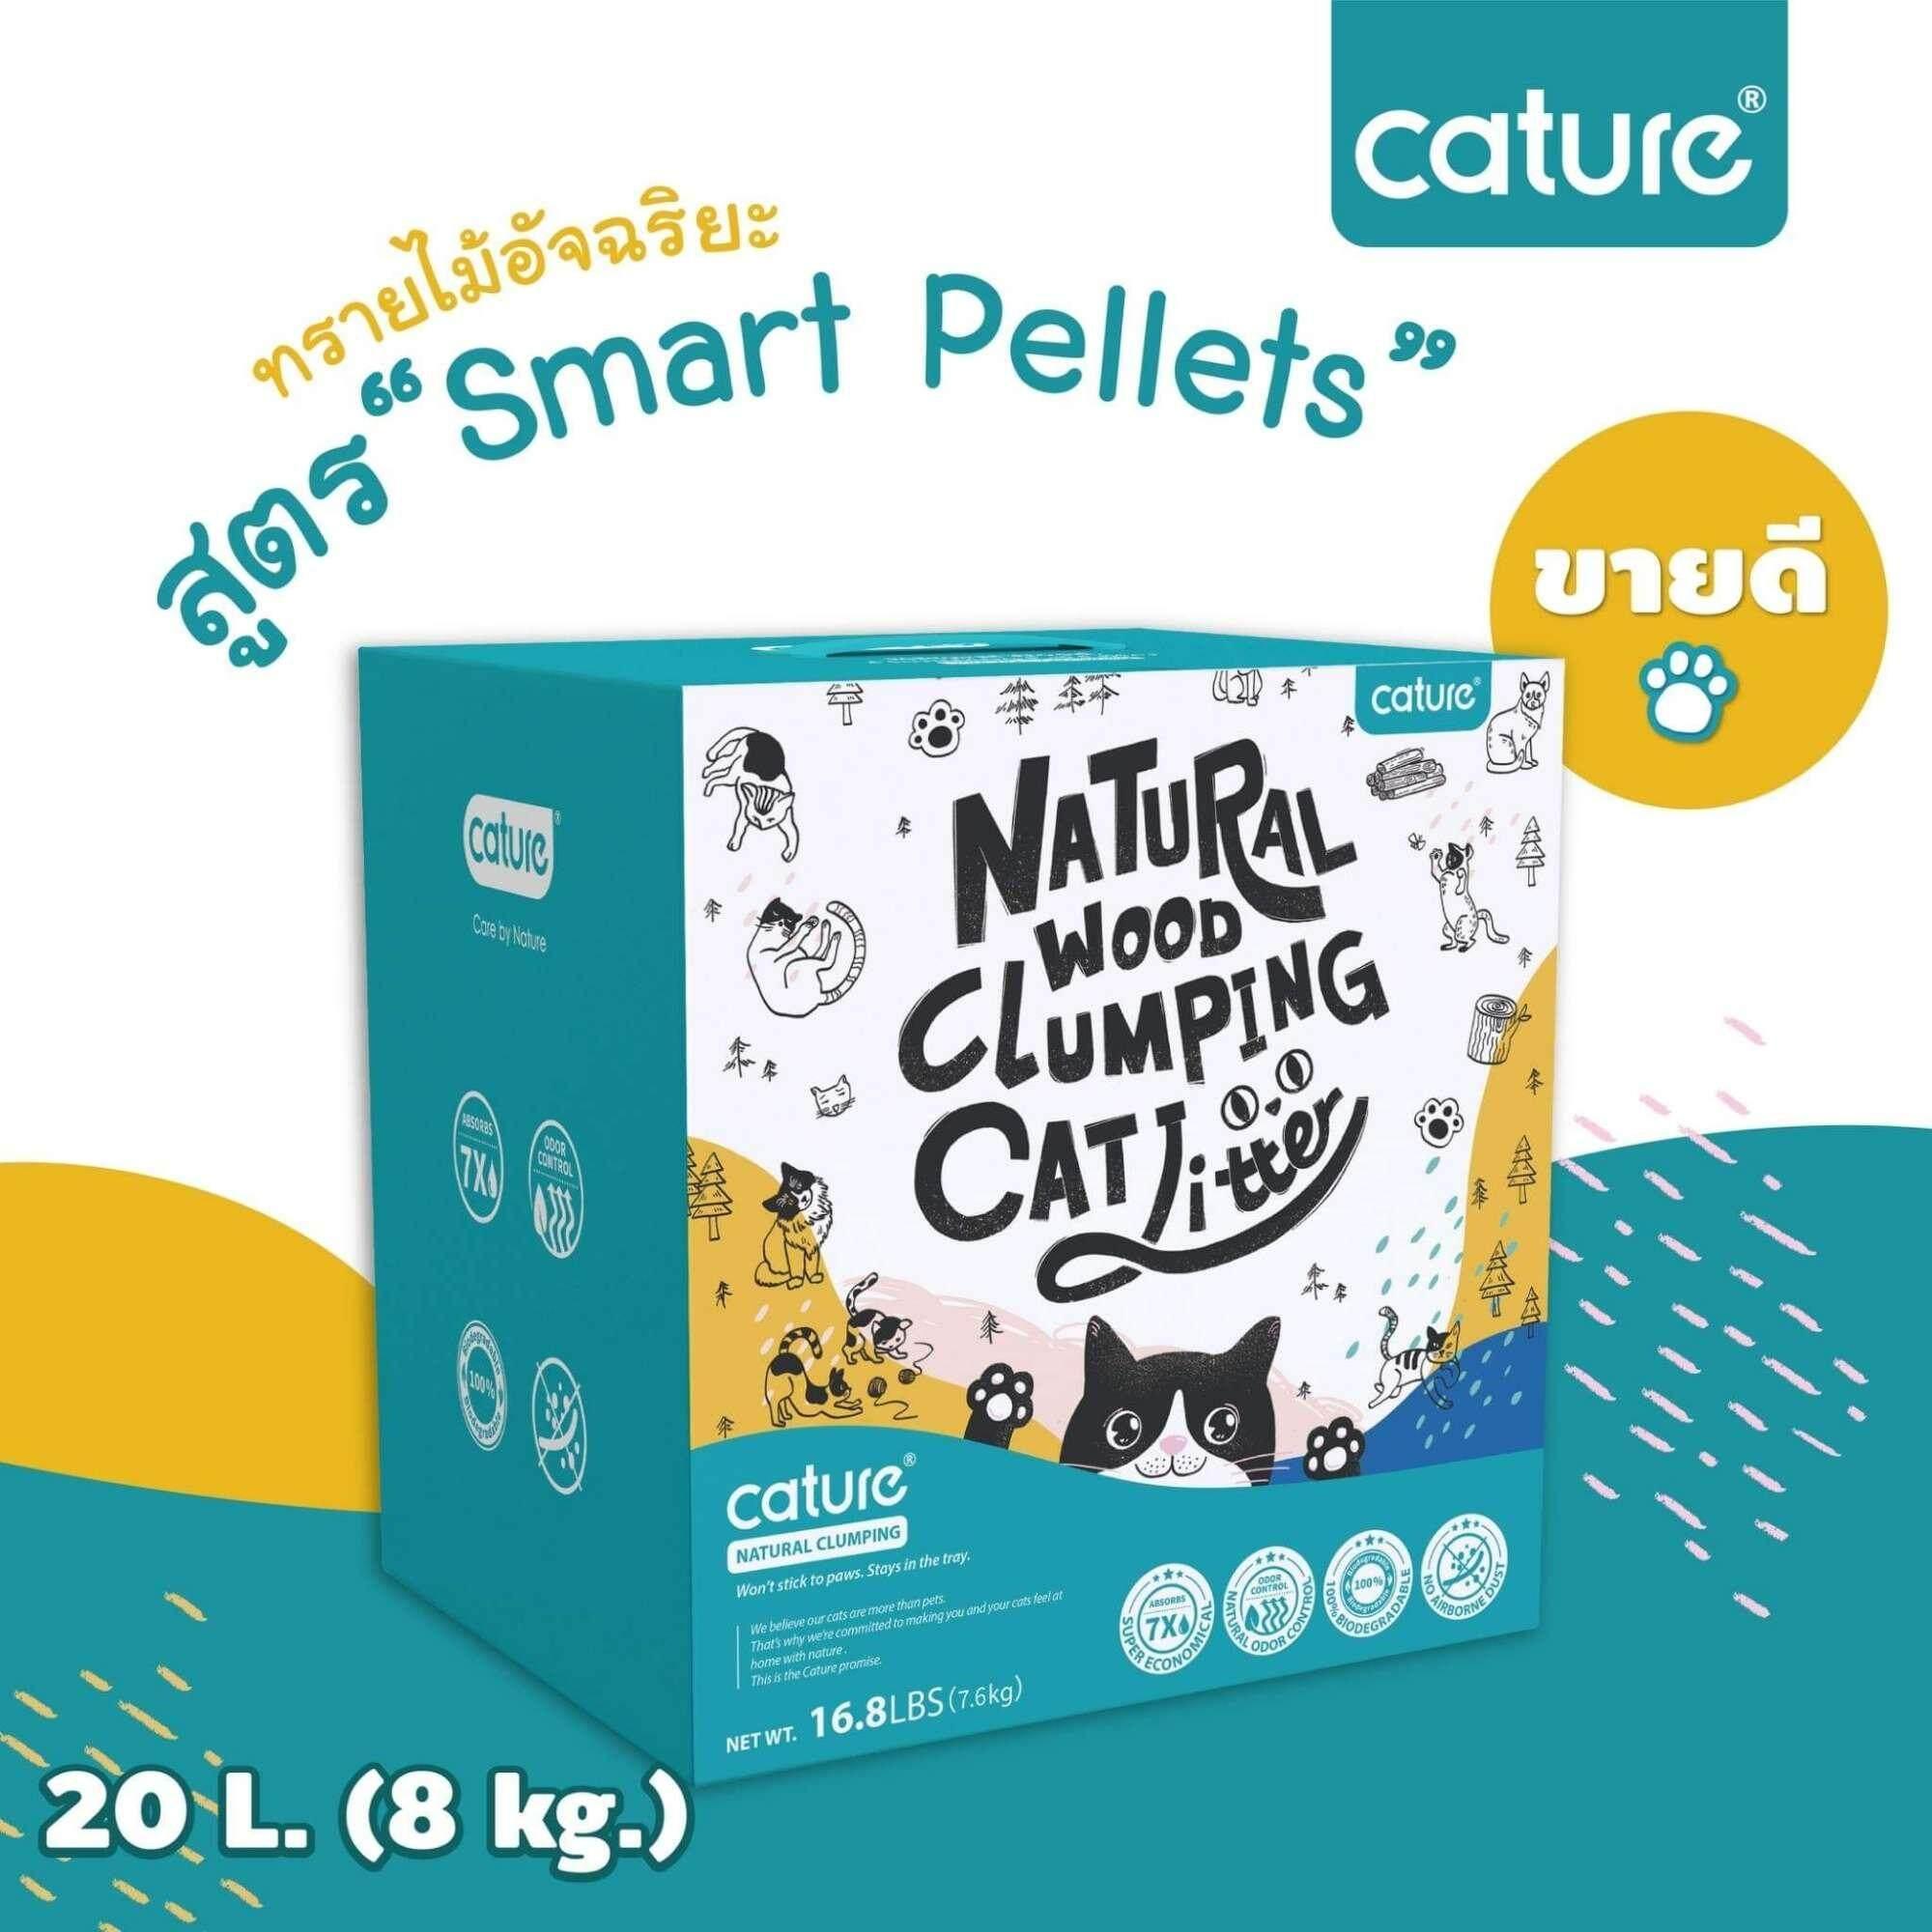 Cature ทรายแมวไม้สนอัจฉริยะ สูตร Smart Pellets (20l) By Fairycoonz Petshop.